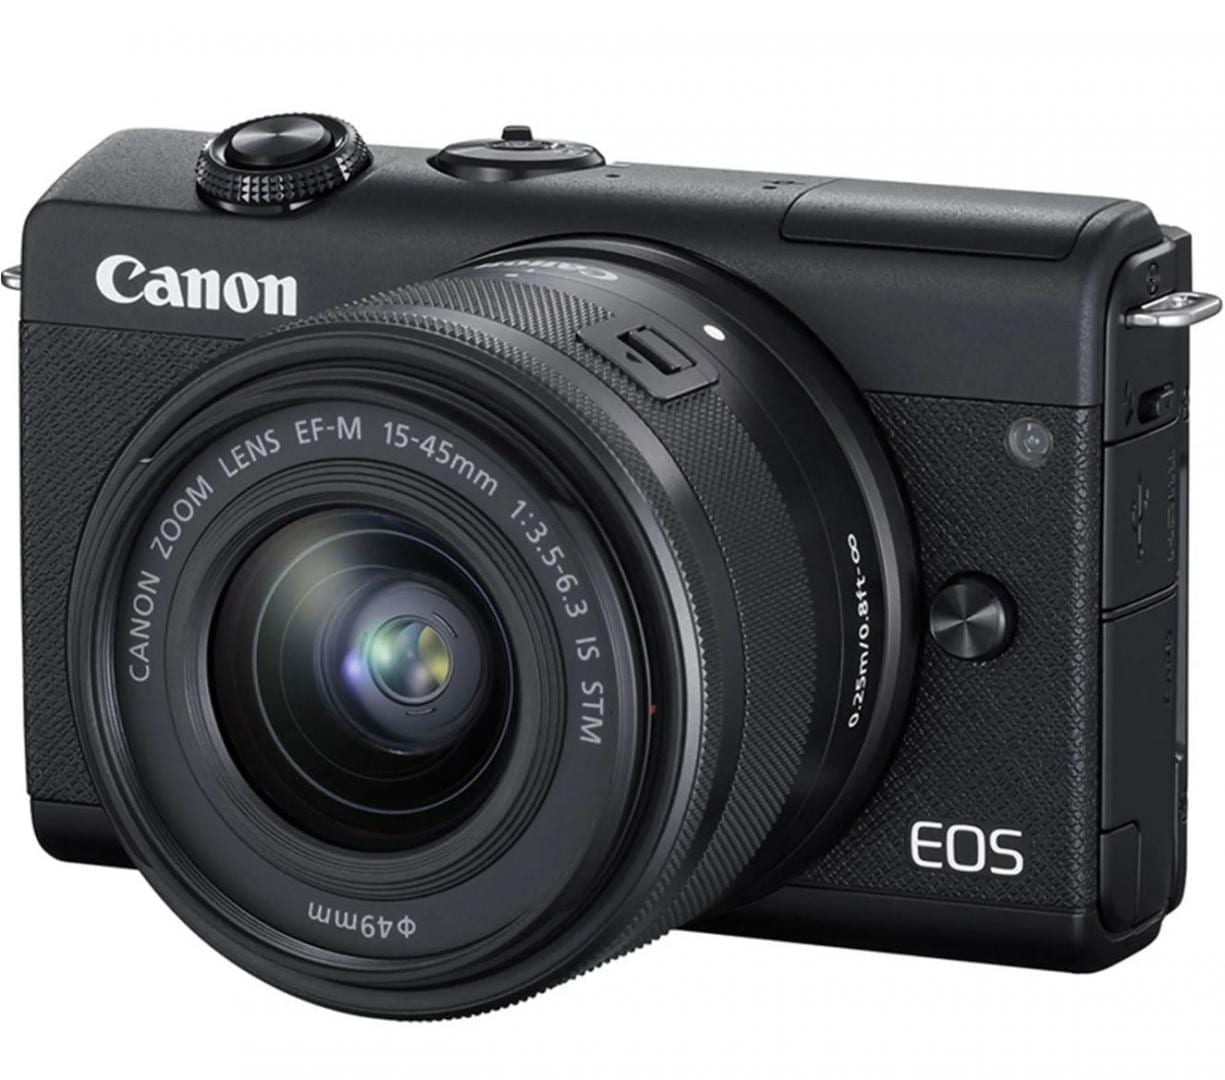 Camera foto mirrorless Canon EOS M200 kit EF-M 15-45mm f/3.5-6.3